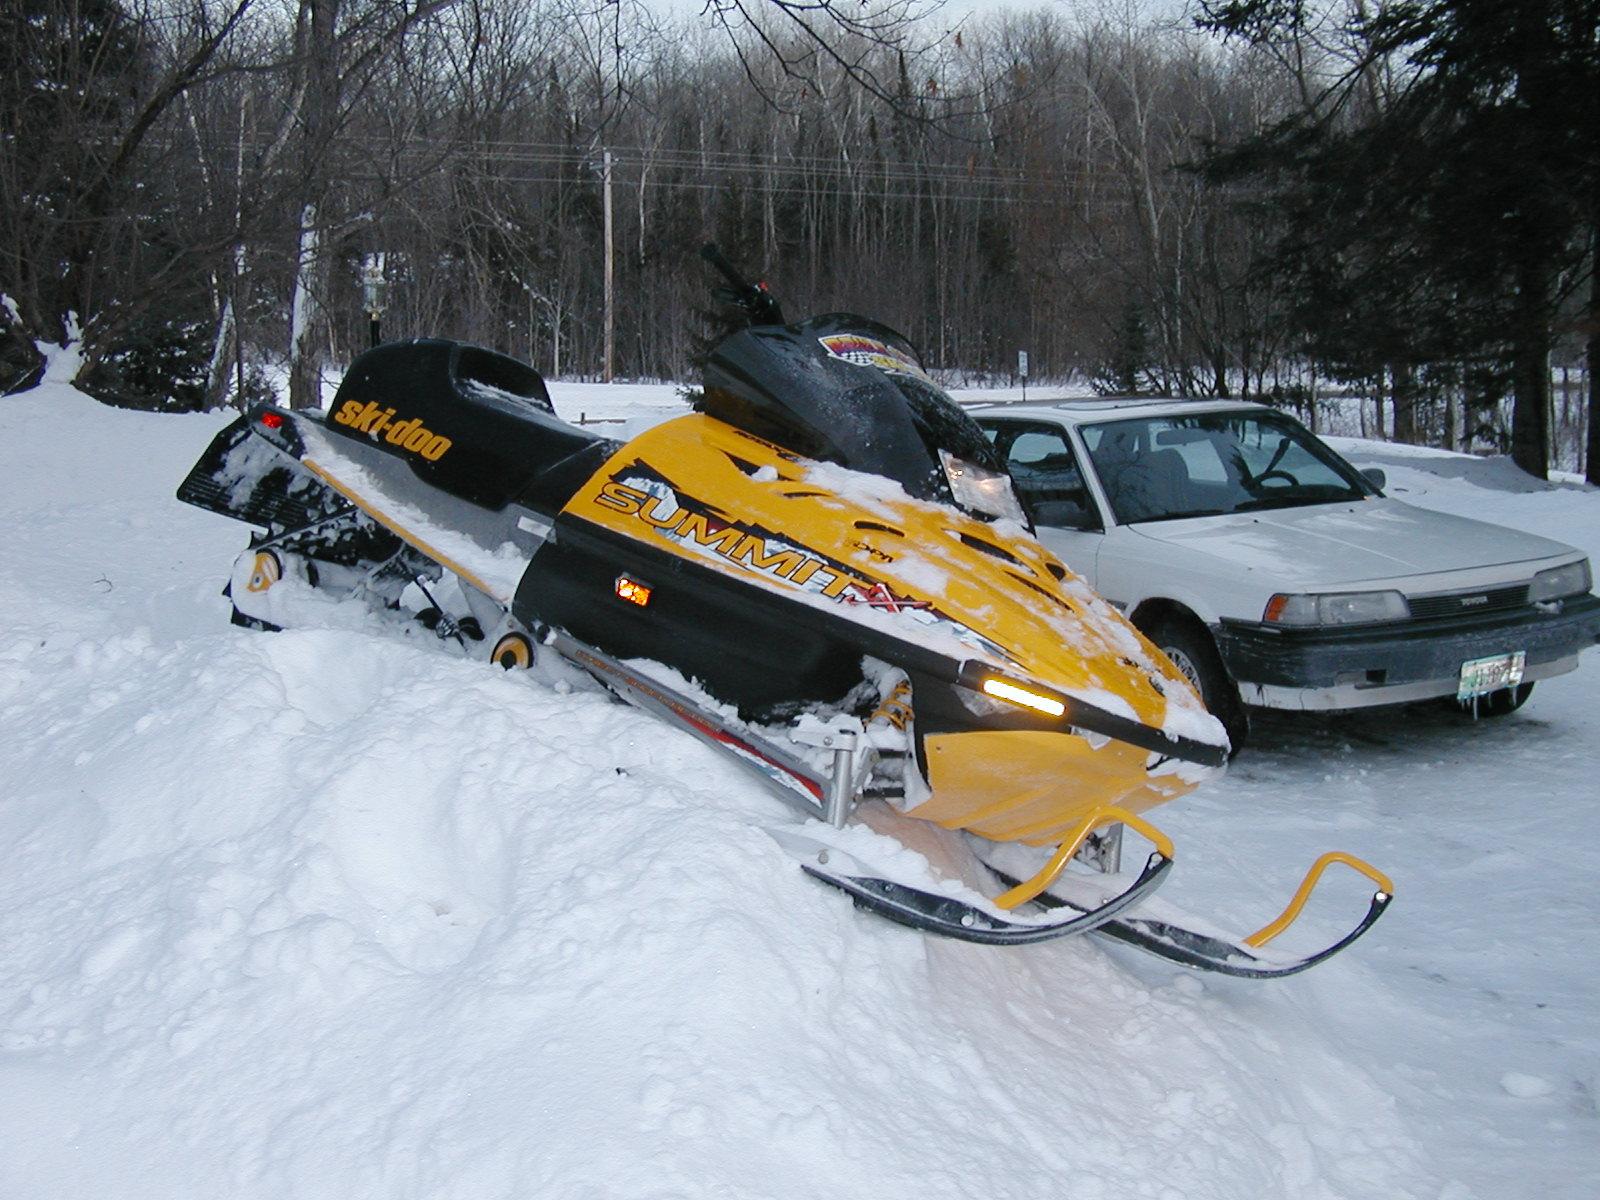 1999 ski doo summit